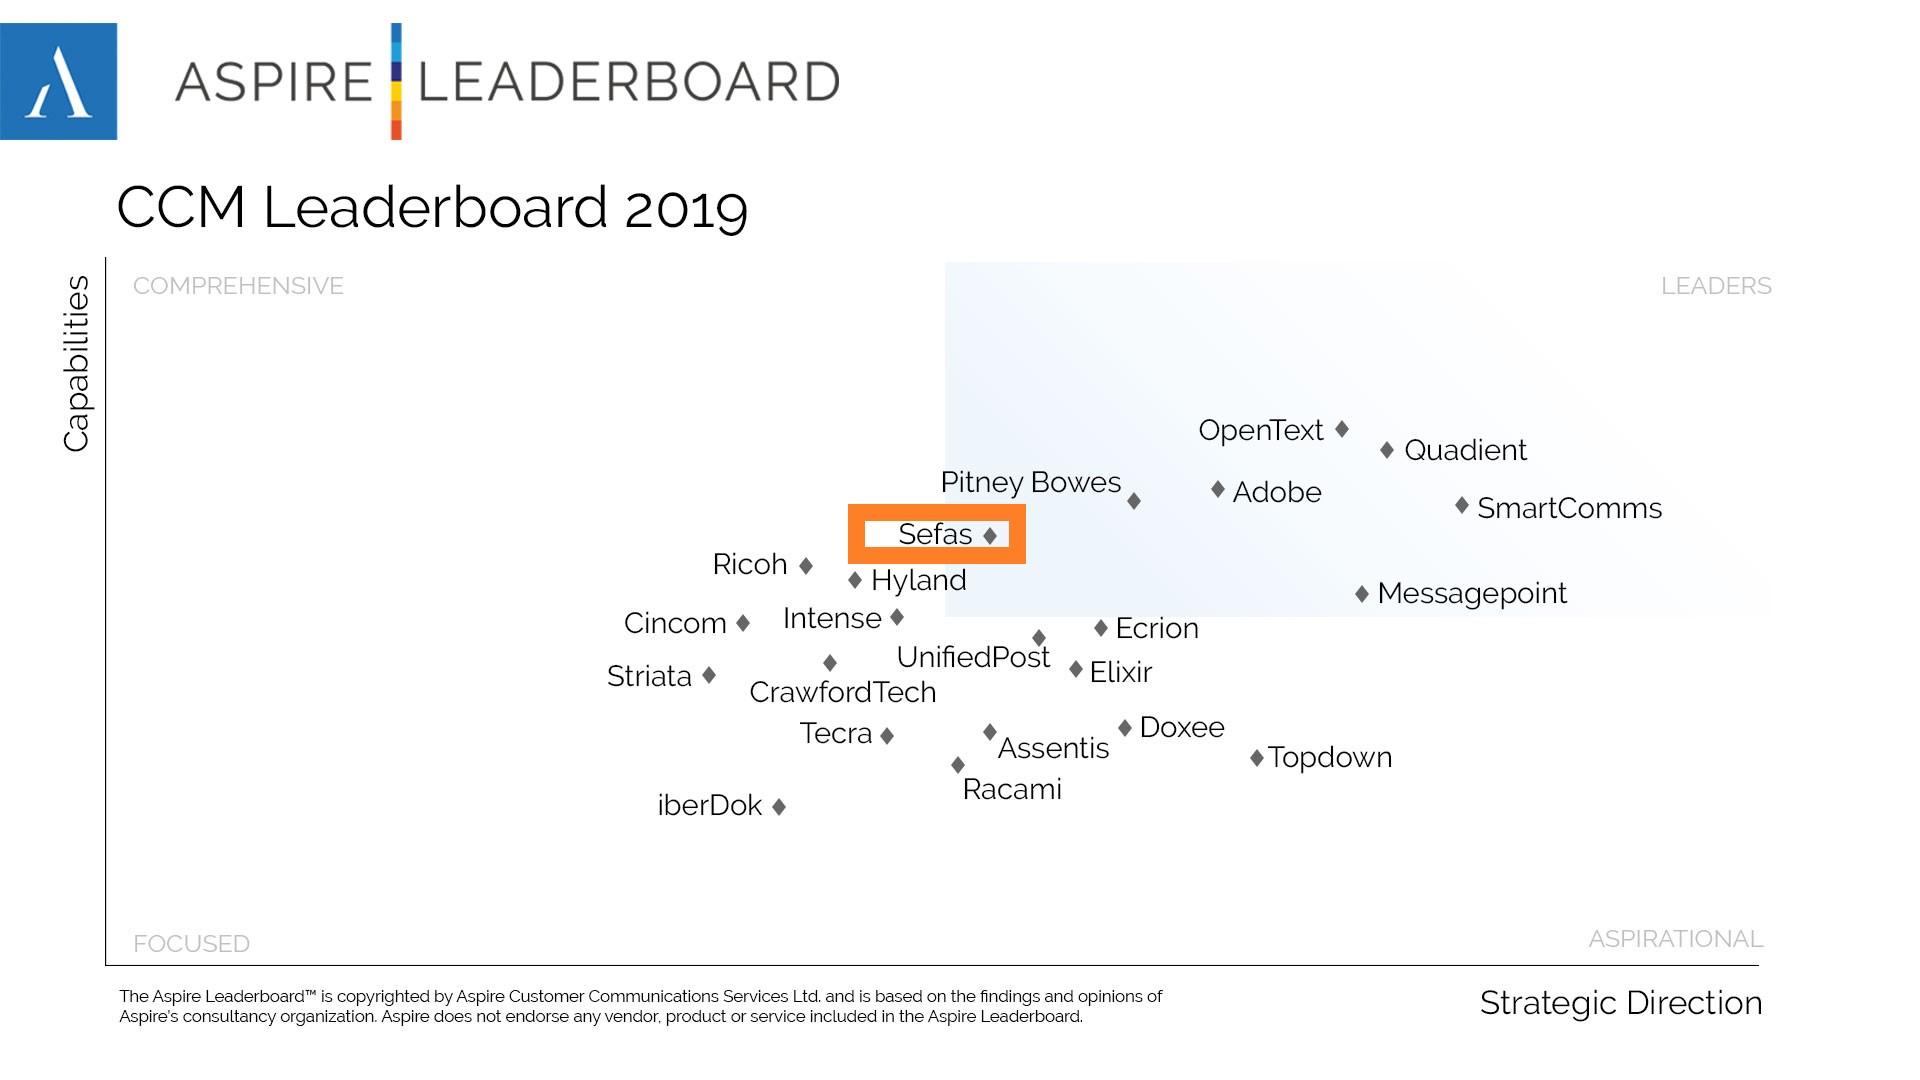 Global CCM LEADERBOARD 2019